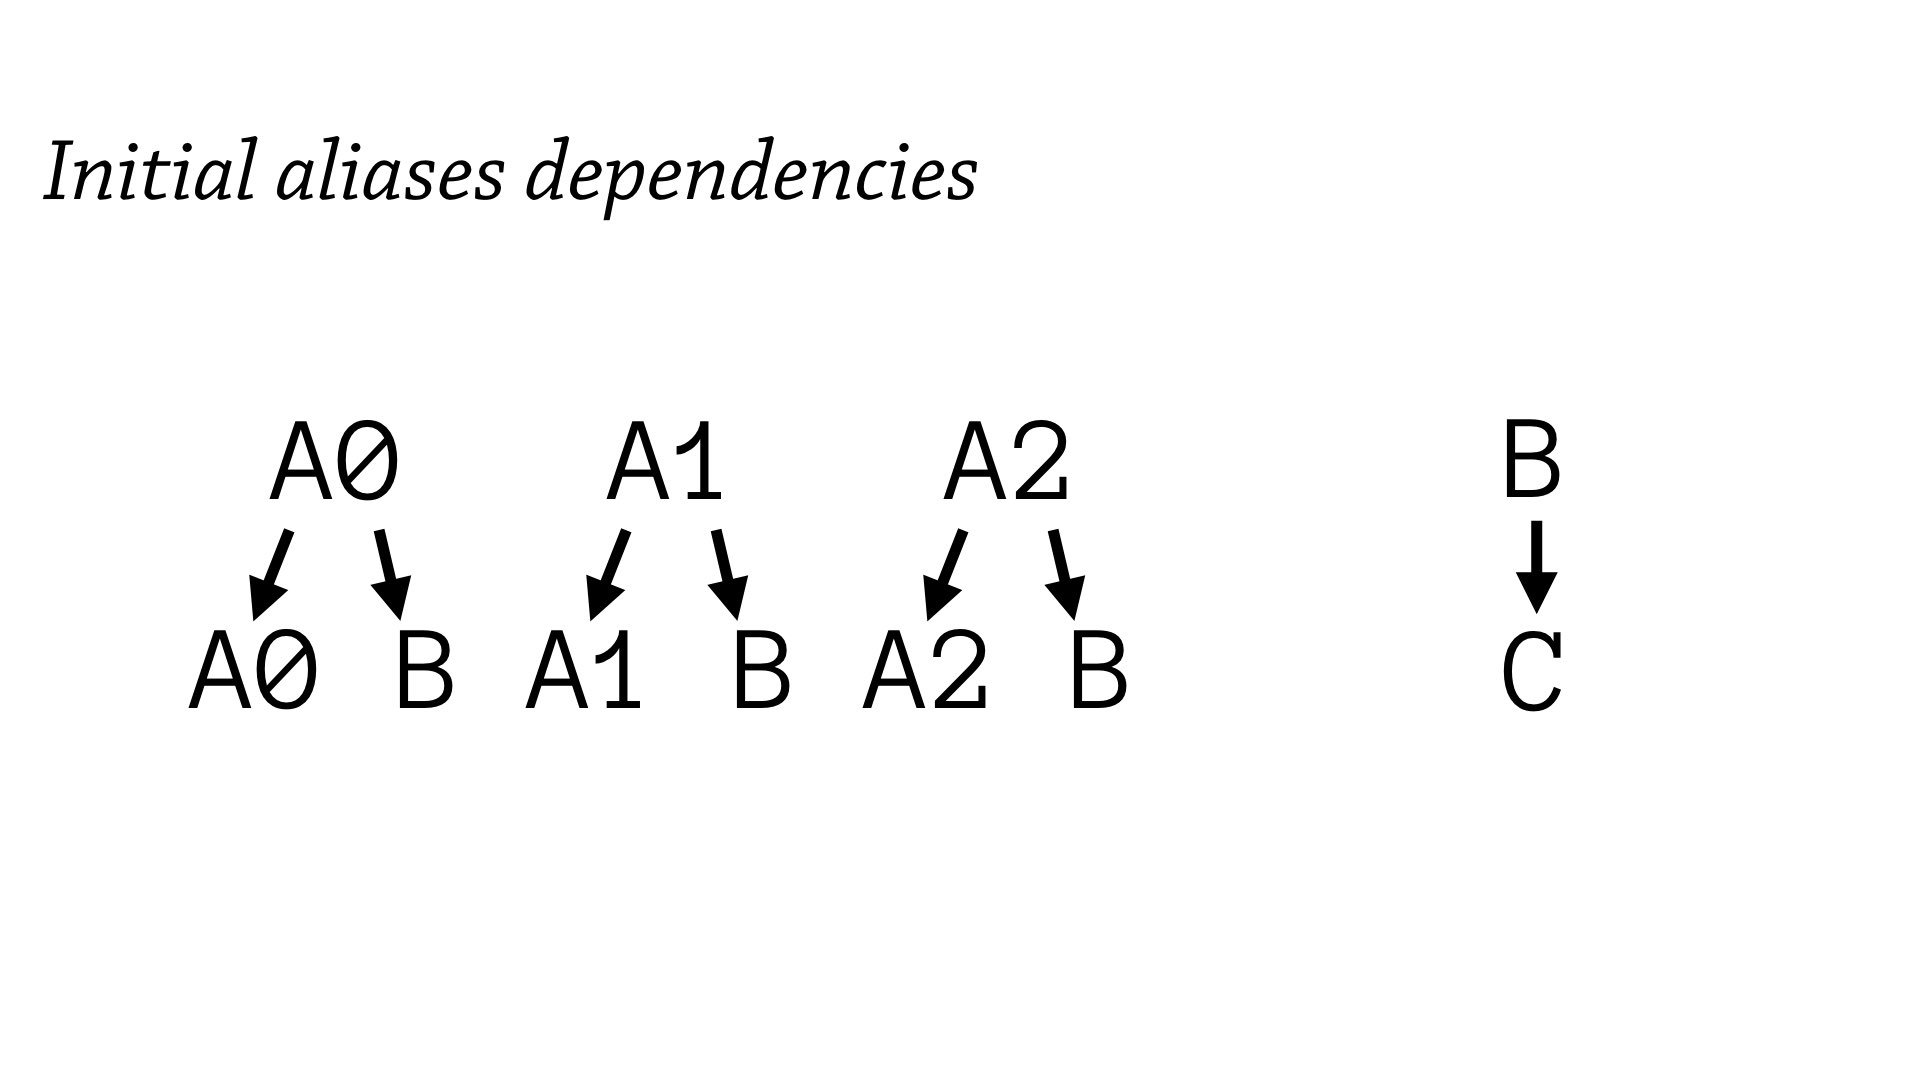 Initial alias dependencies